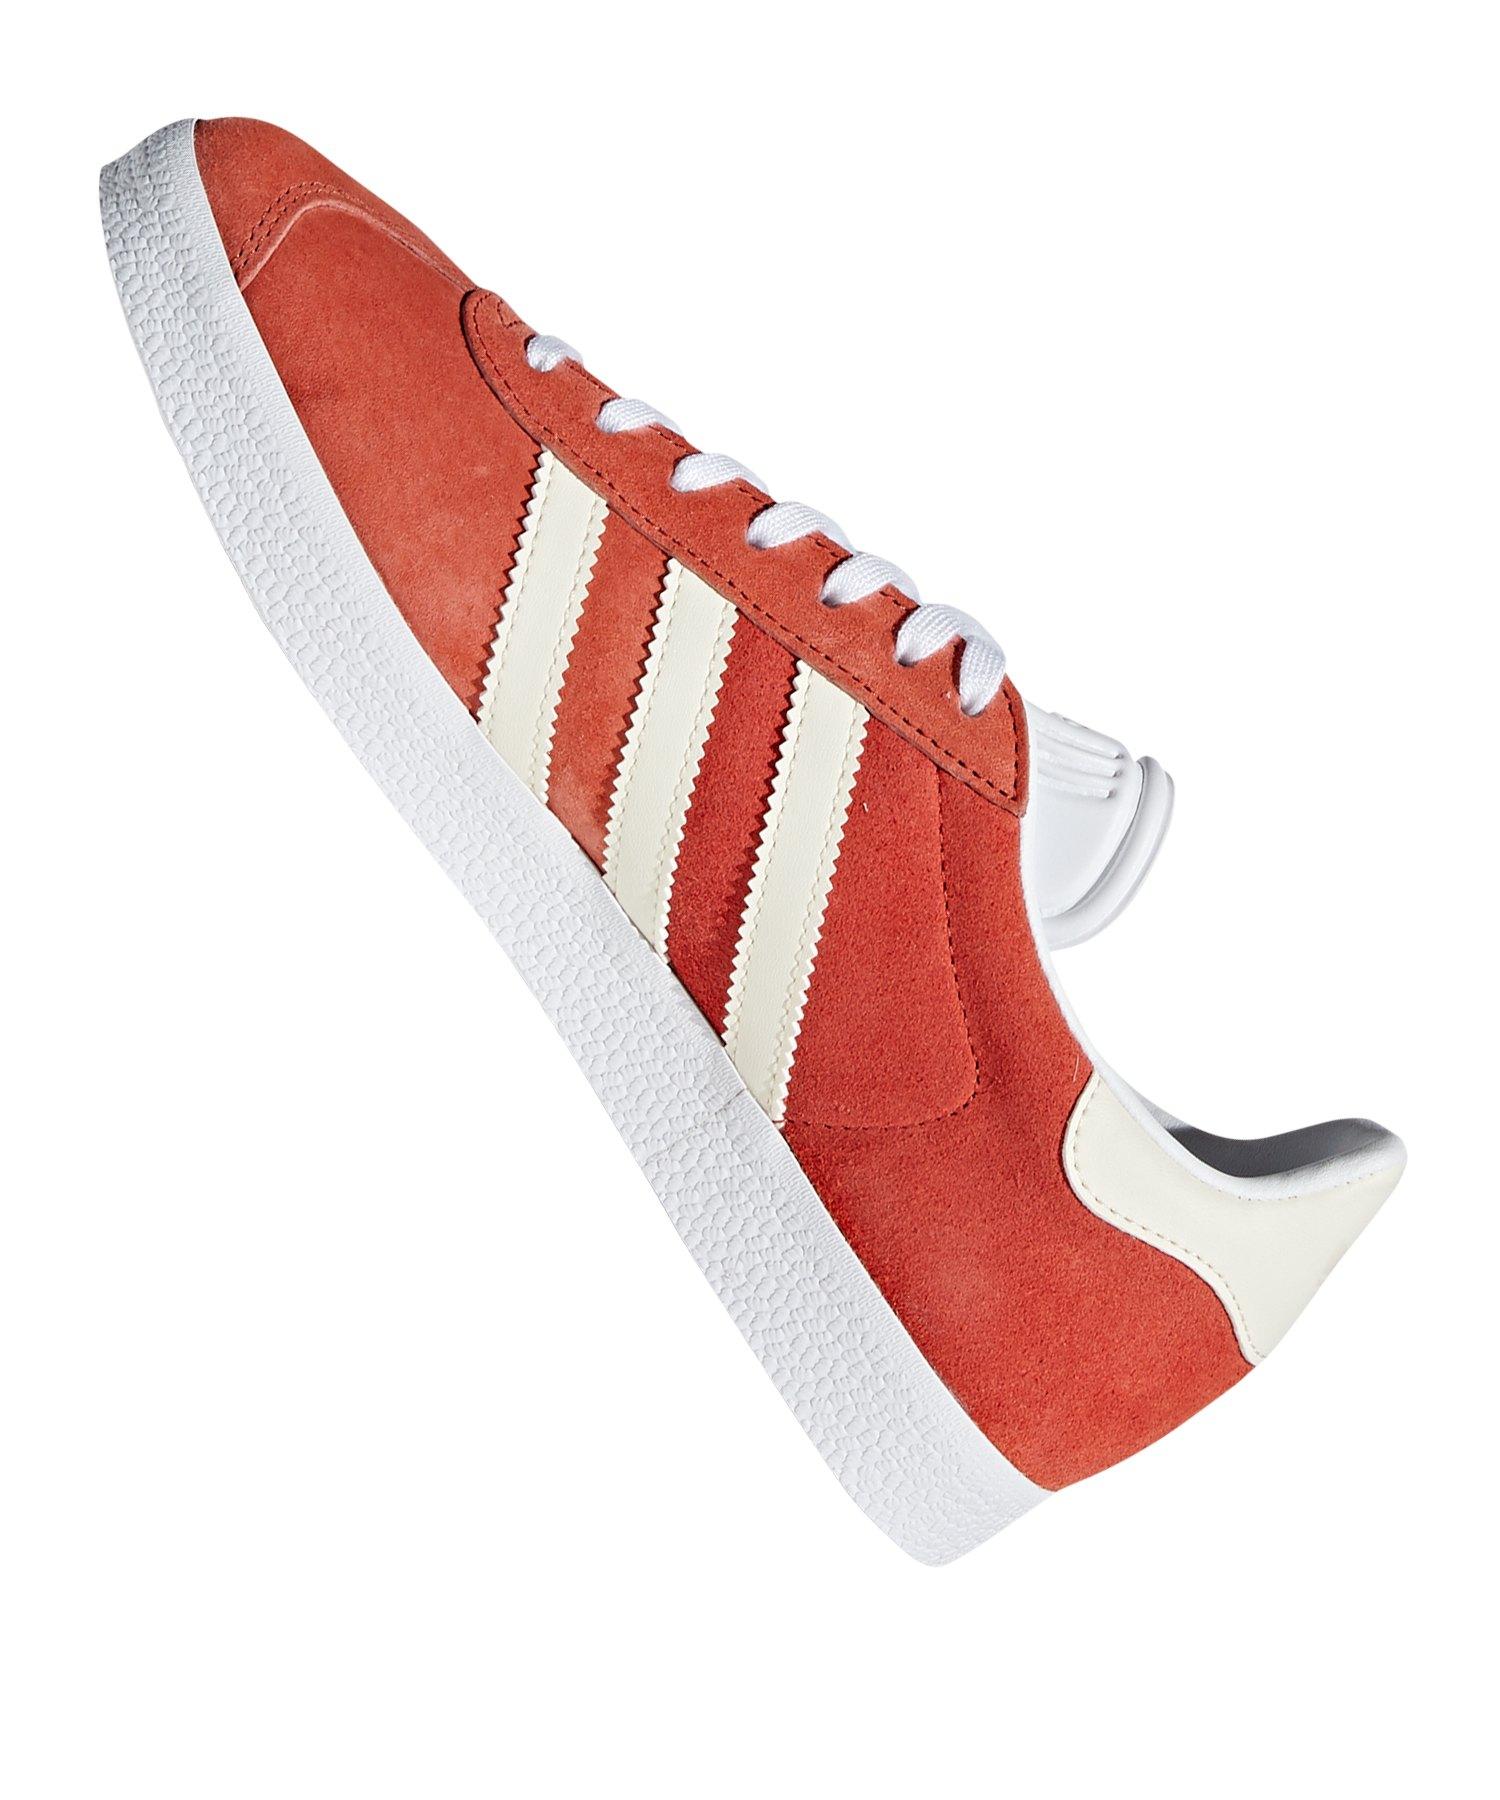 Gazelle Adidas Sneaker Braun Damen Weiss Originals 3RLAqcj54